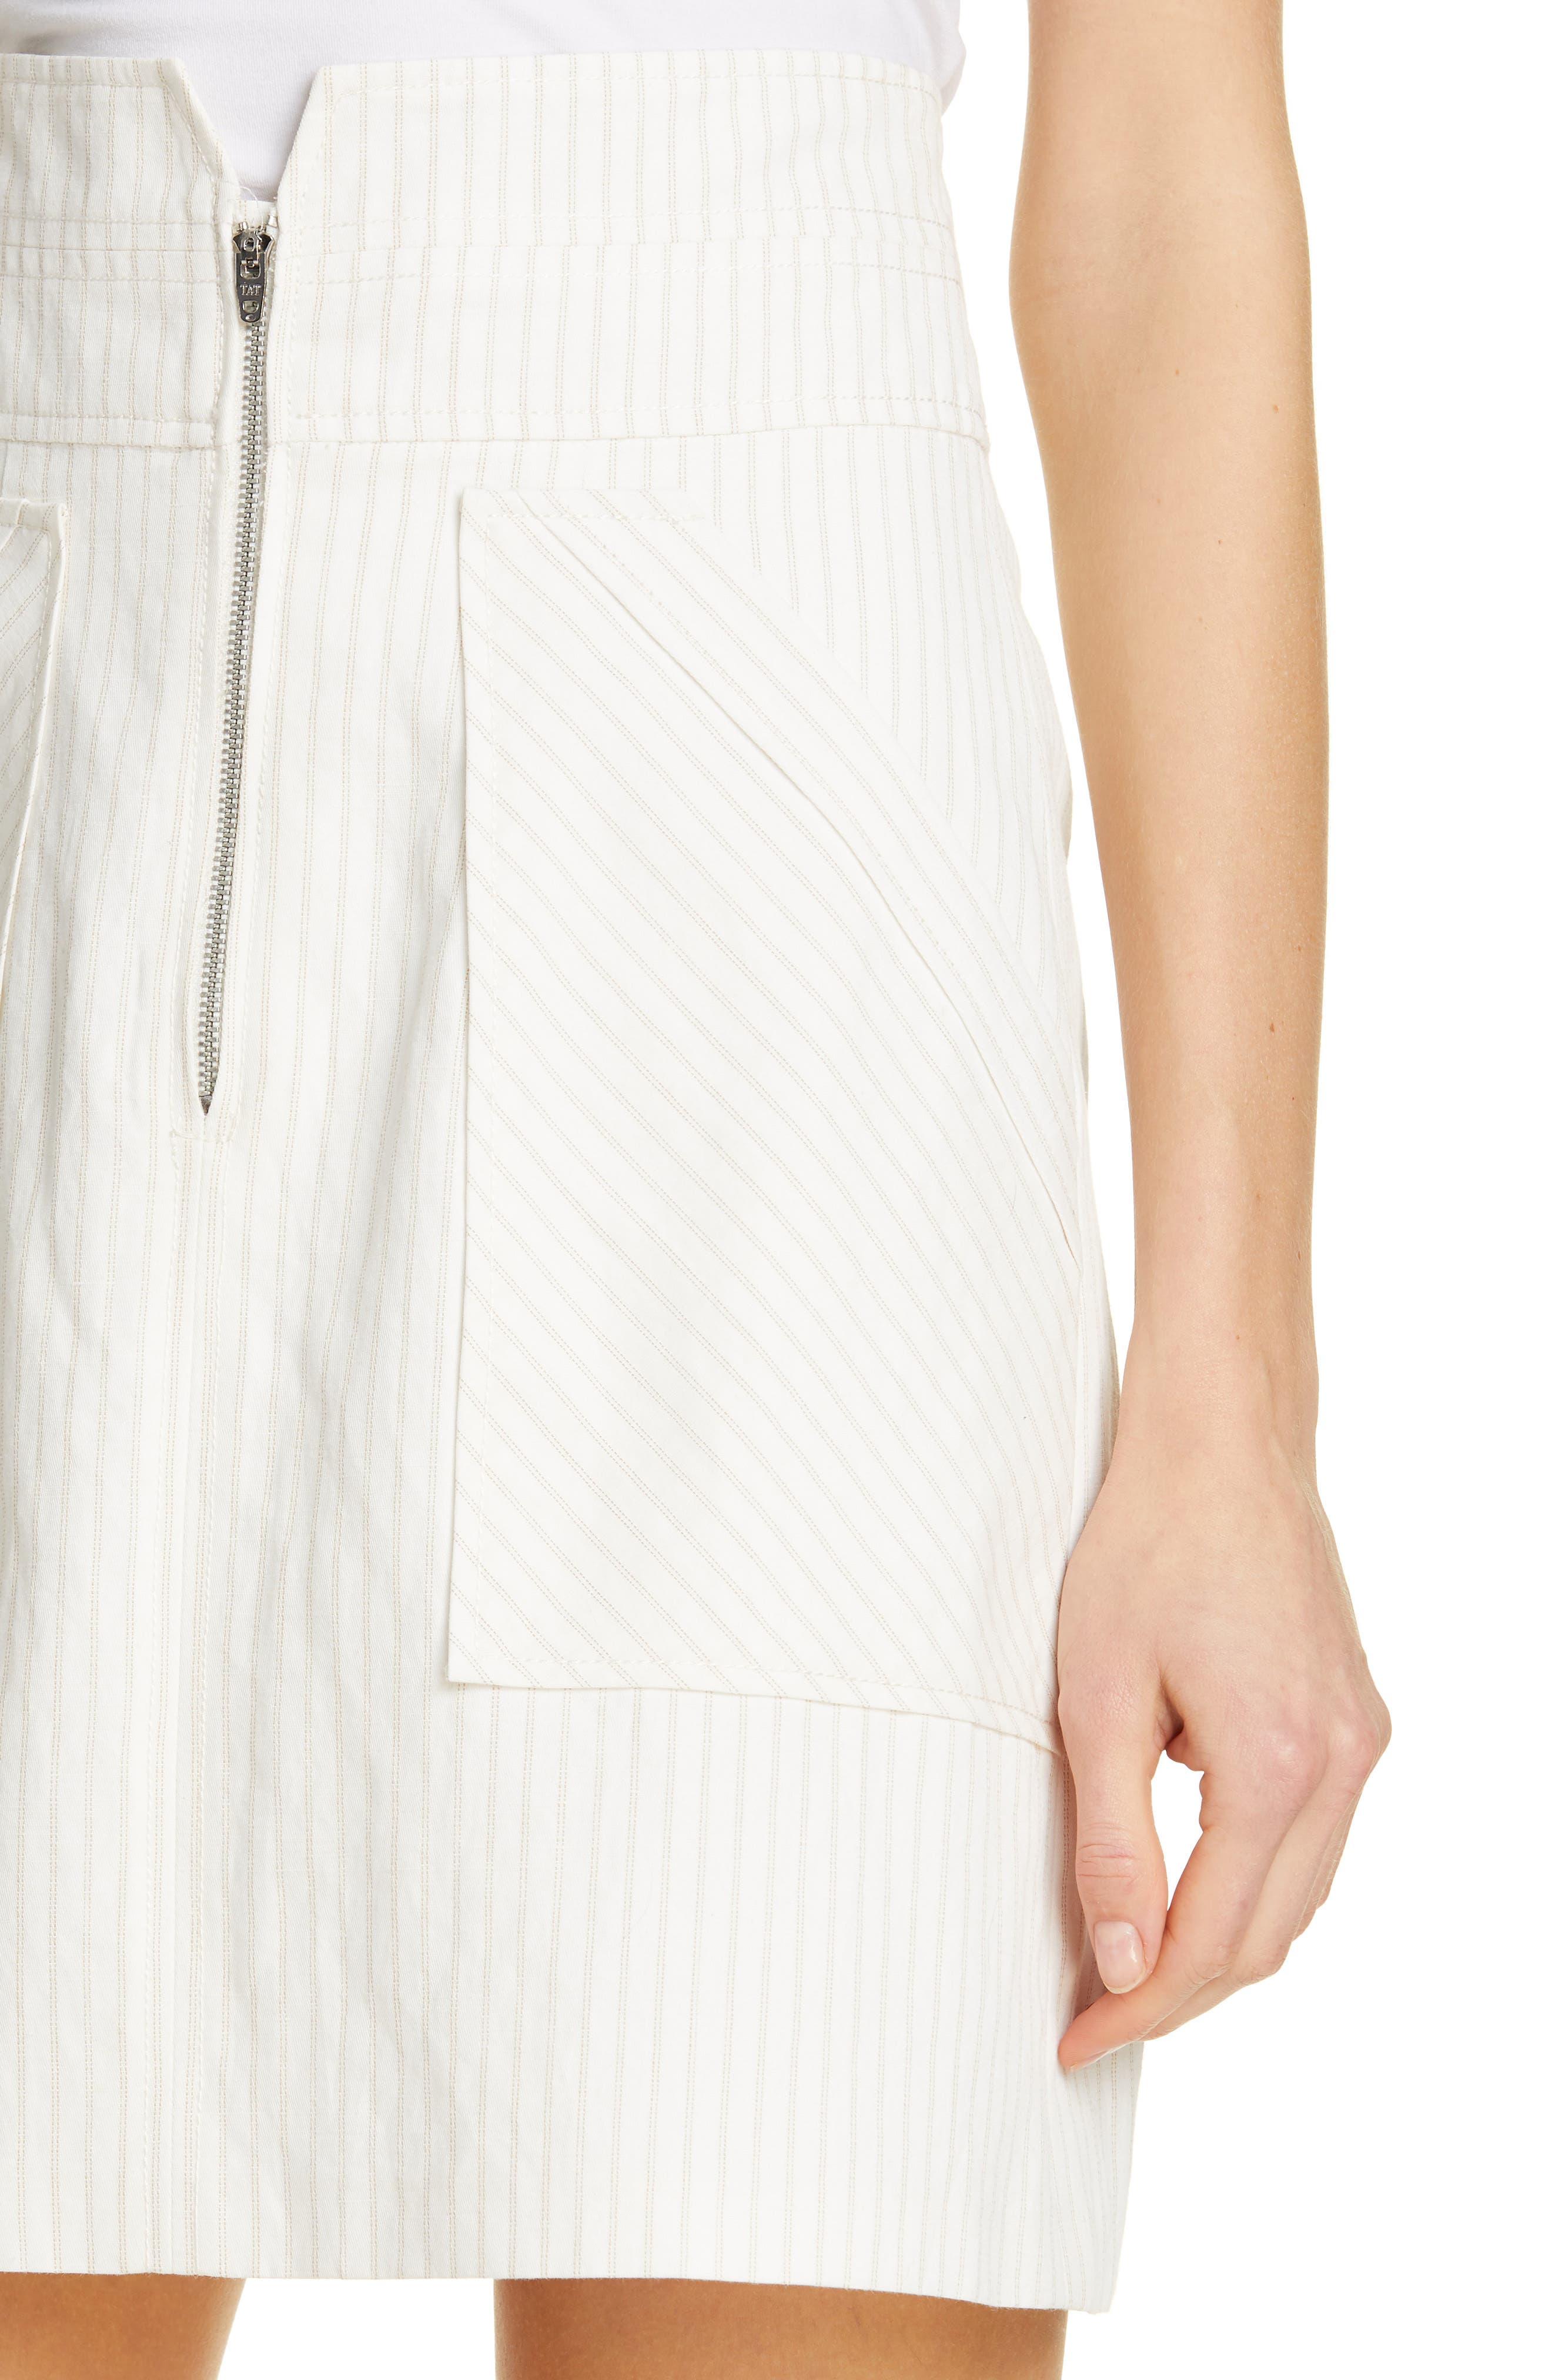 REBECCA TAYLOR, Zip Front Pinstripe Cotton & Linen Skirt, Alternate thumbnail 4, color, SNOW COMBO